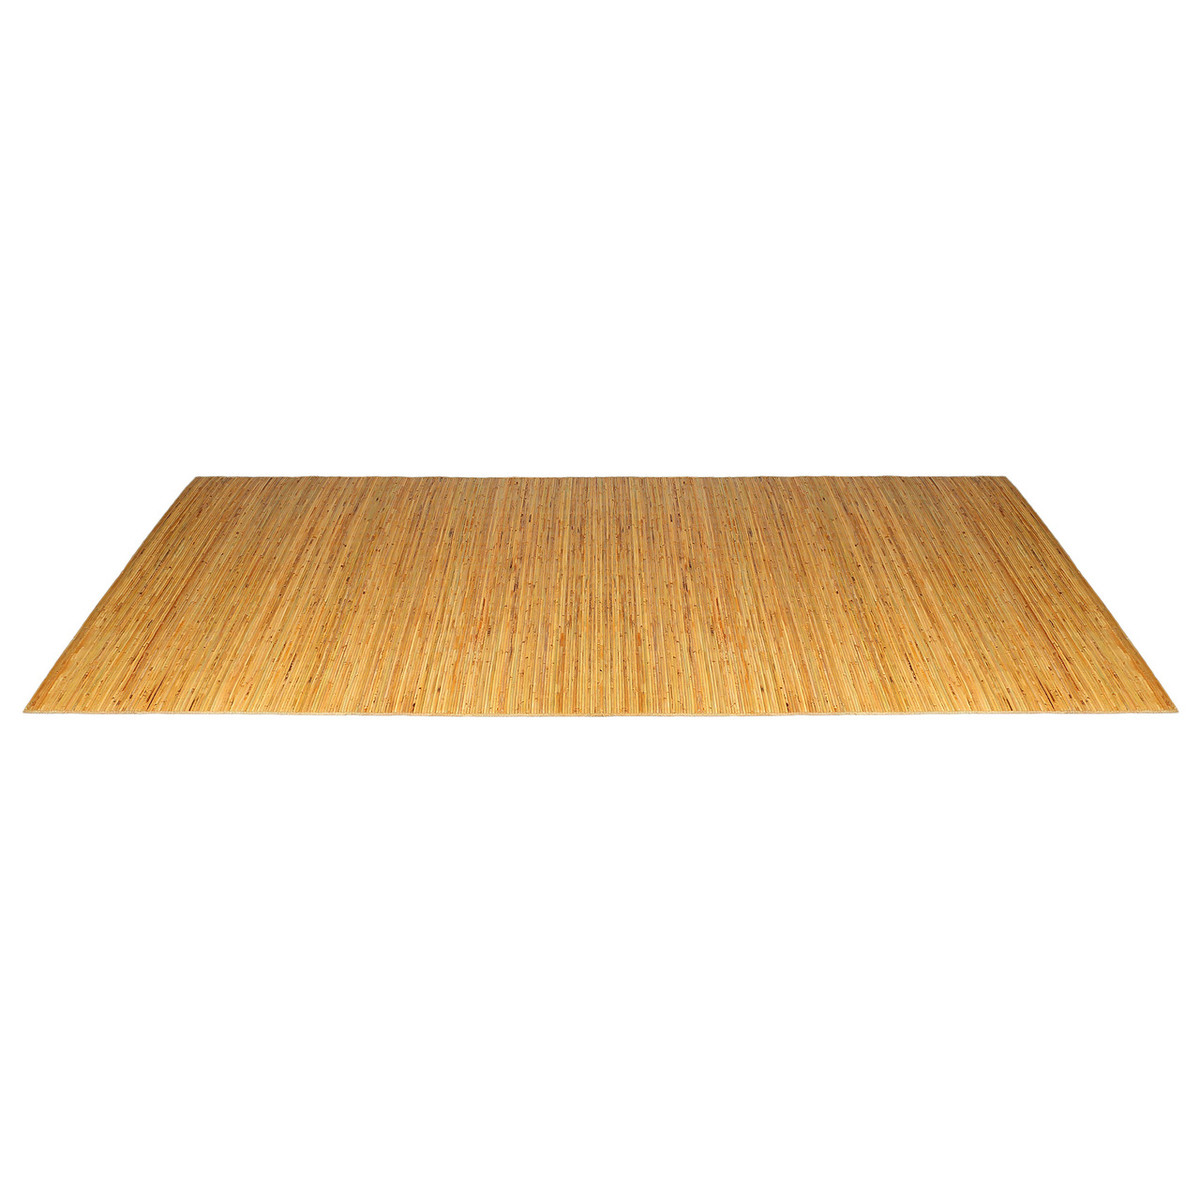 bali natural bamboo area rug, 5' x 8' (ja-rg-nb-5x8) - joseph allen